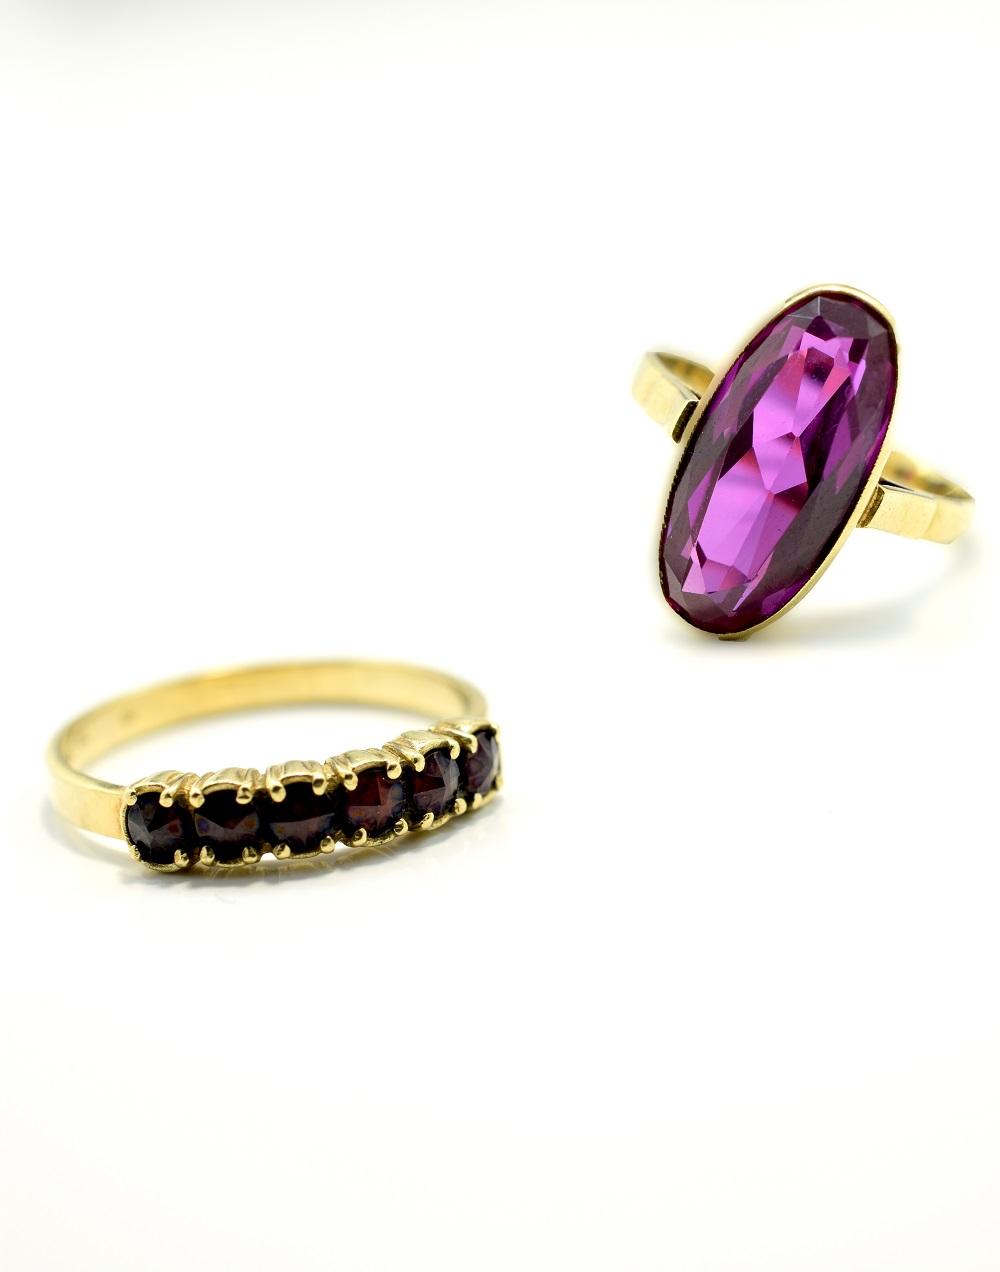 zlaté prsteny v eshopu - online prodej